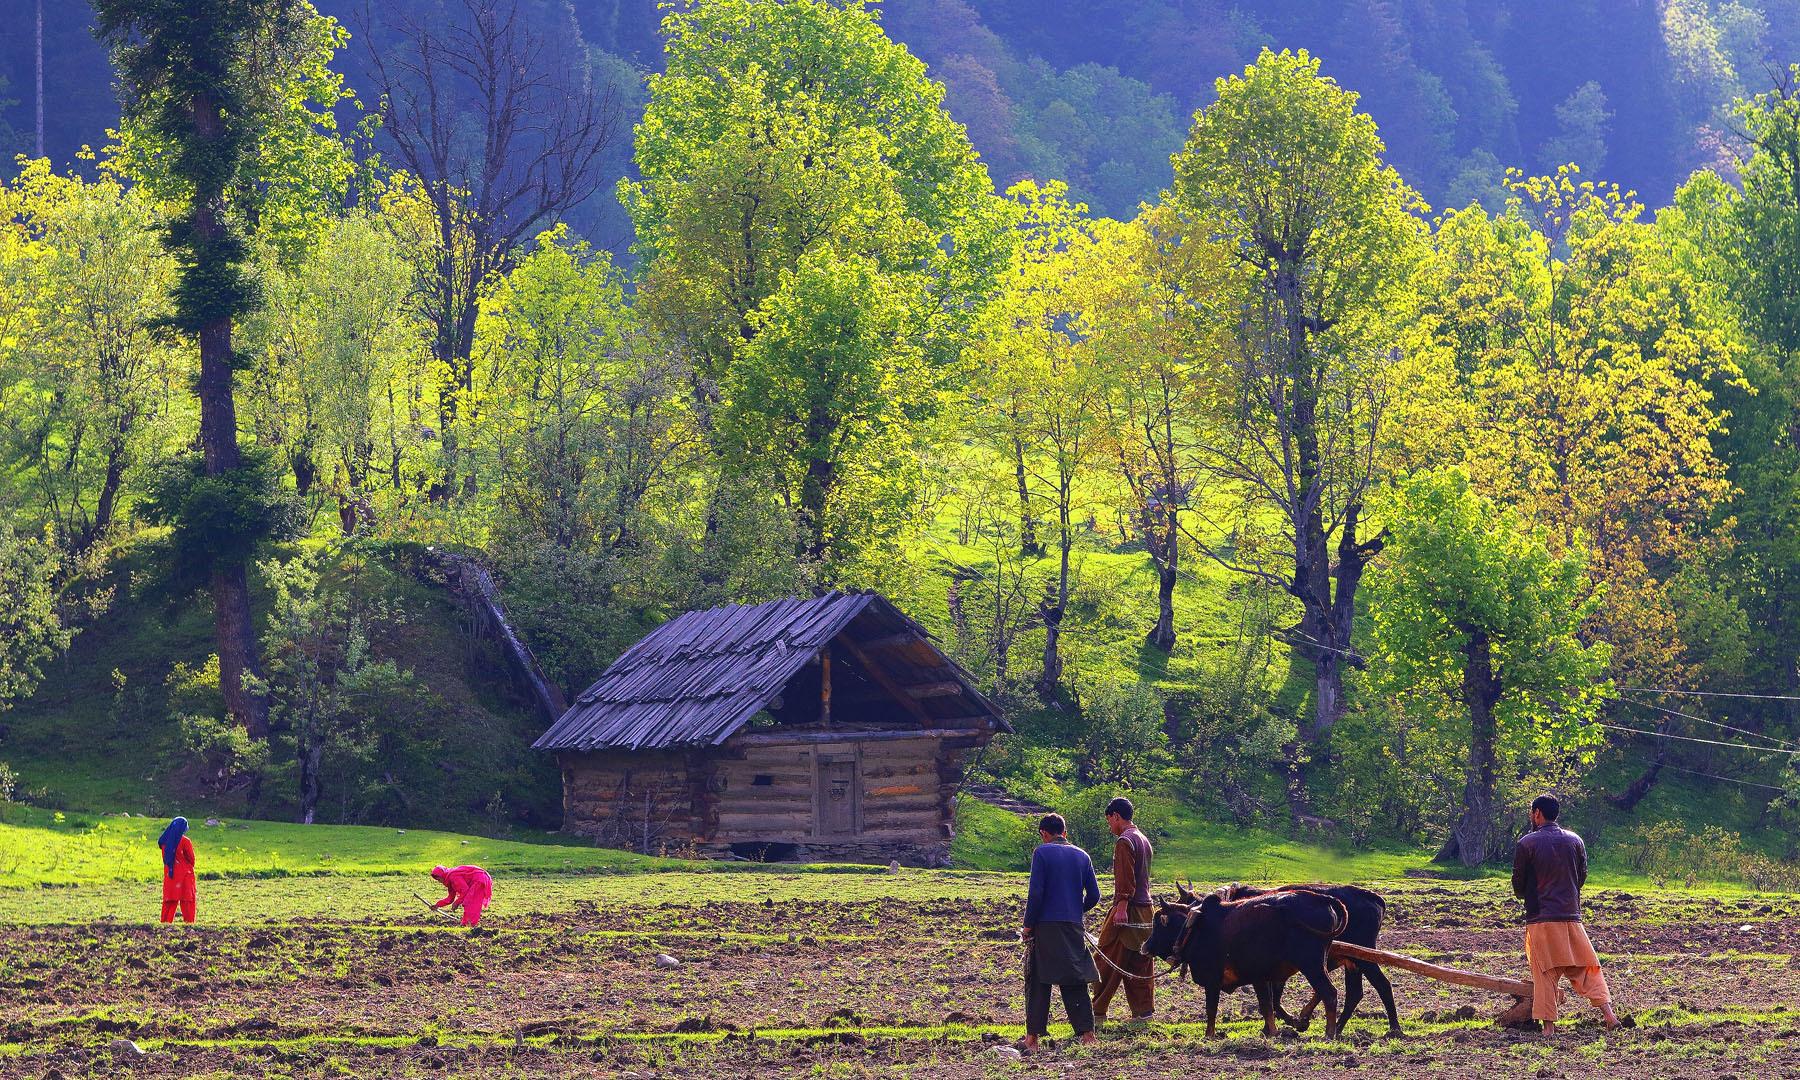 تاؤ بٹ کے کھیت.— فوٹو سید مہدی بخاری۔